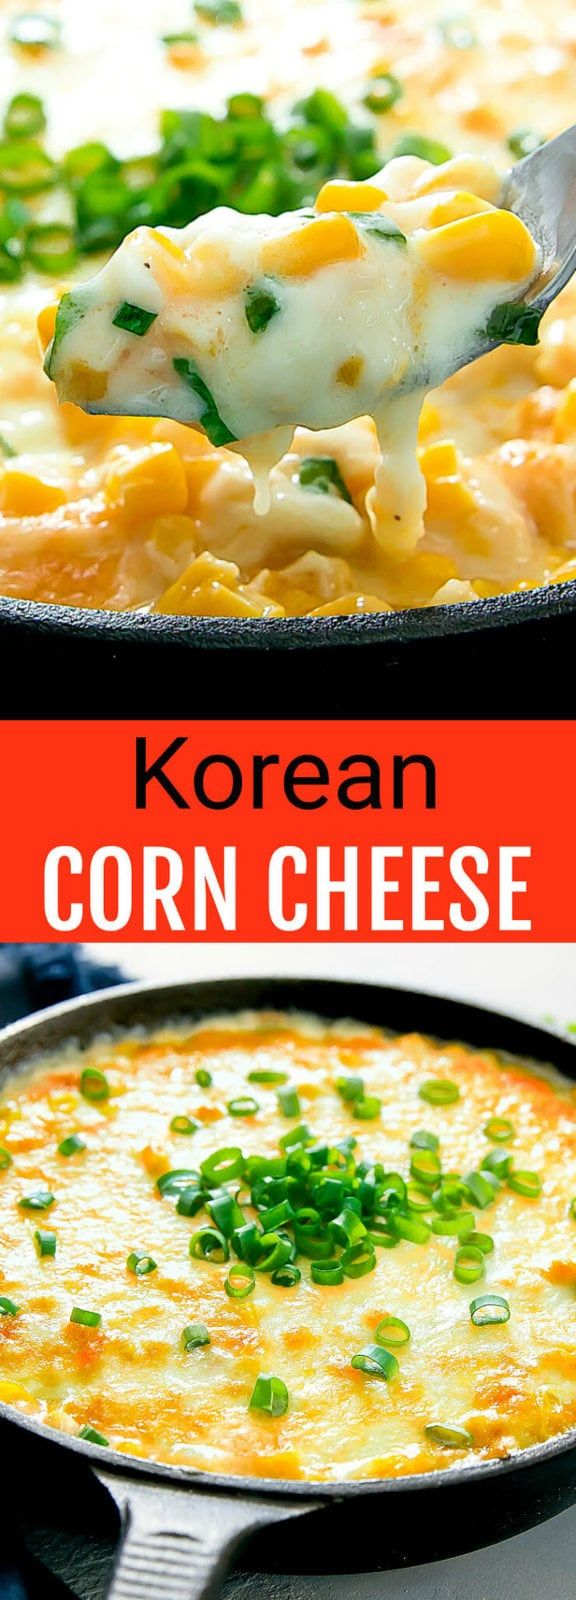 Korean Corn Cheese images